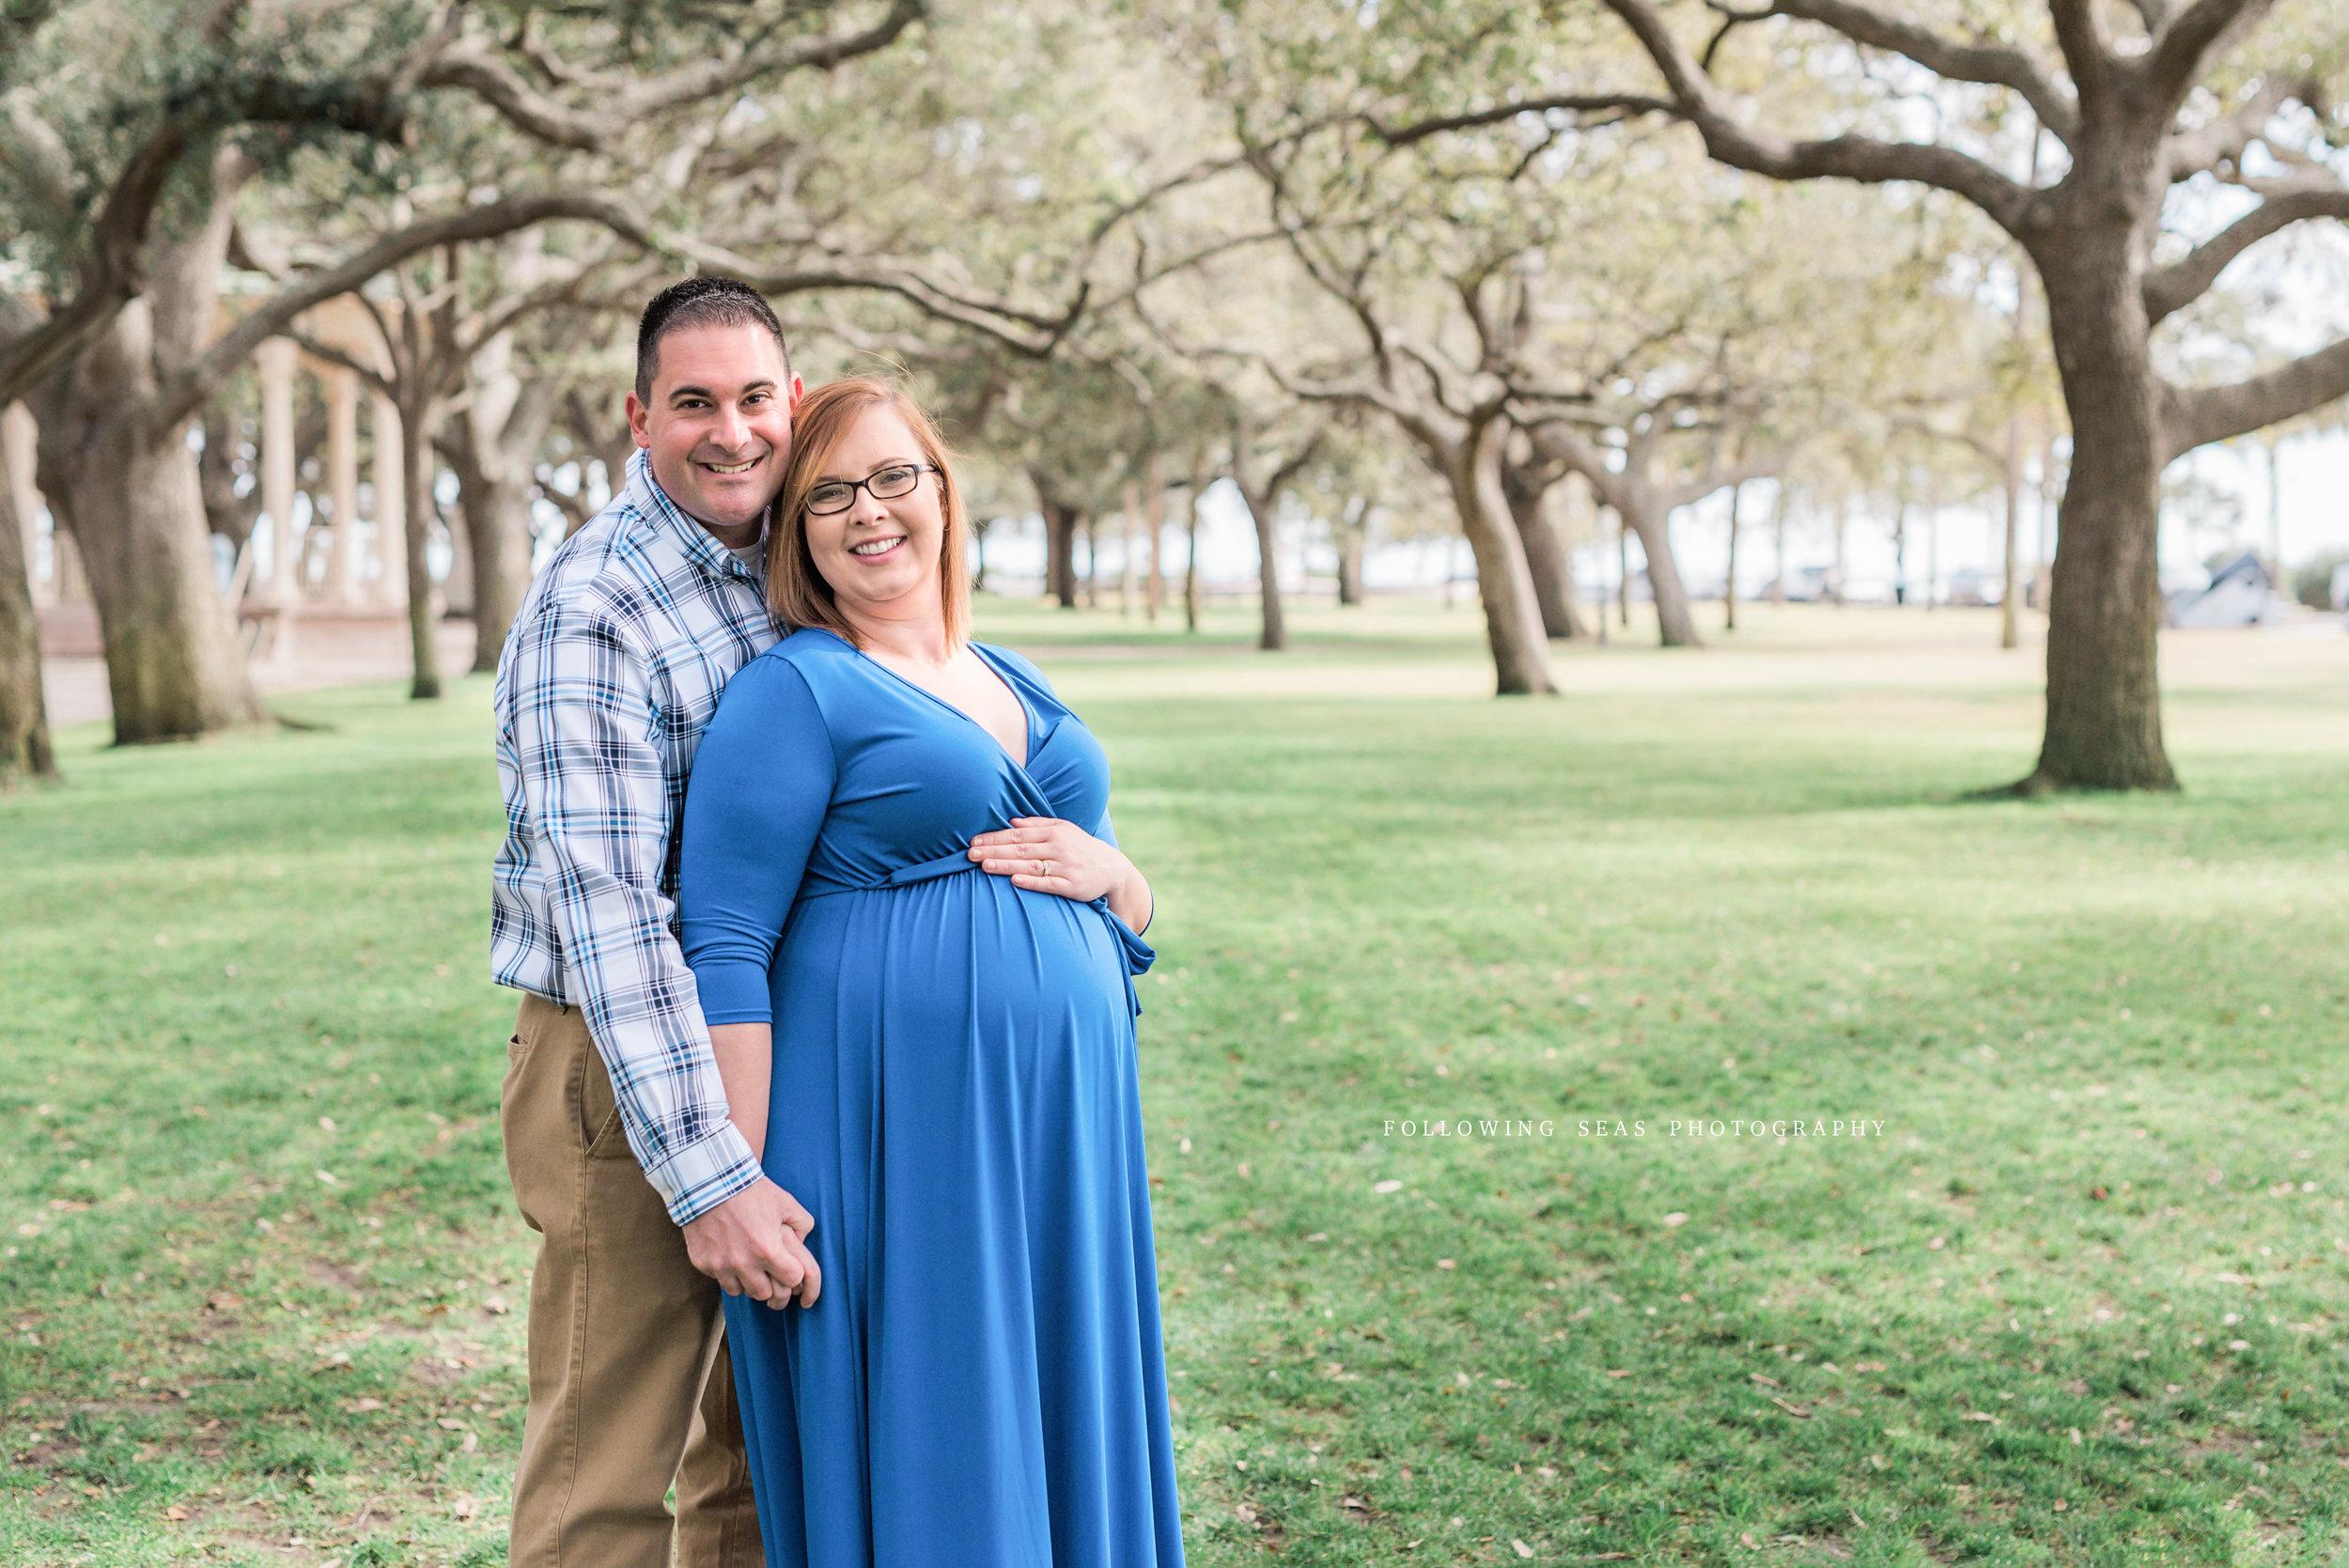 Charleston-Maternity-Photographer-Following-Seas-Photography-7921.jpg